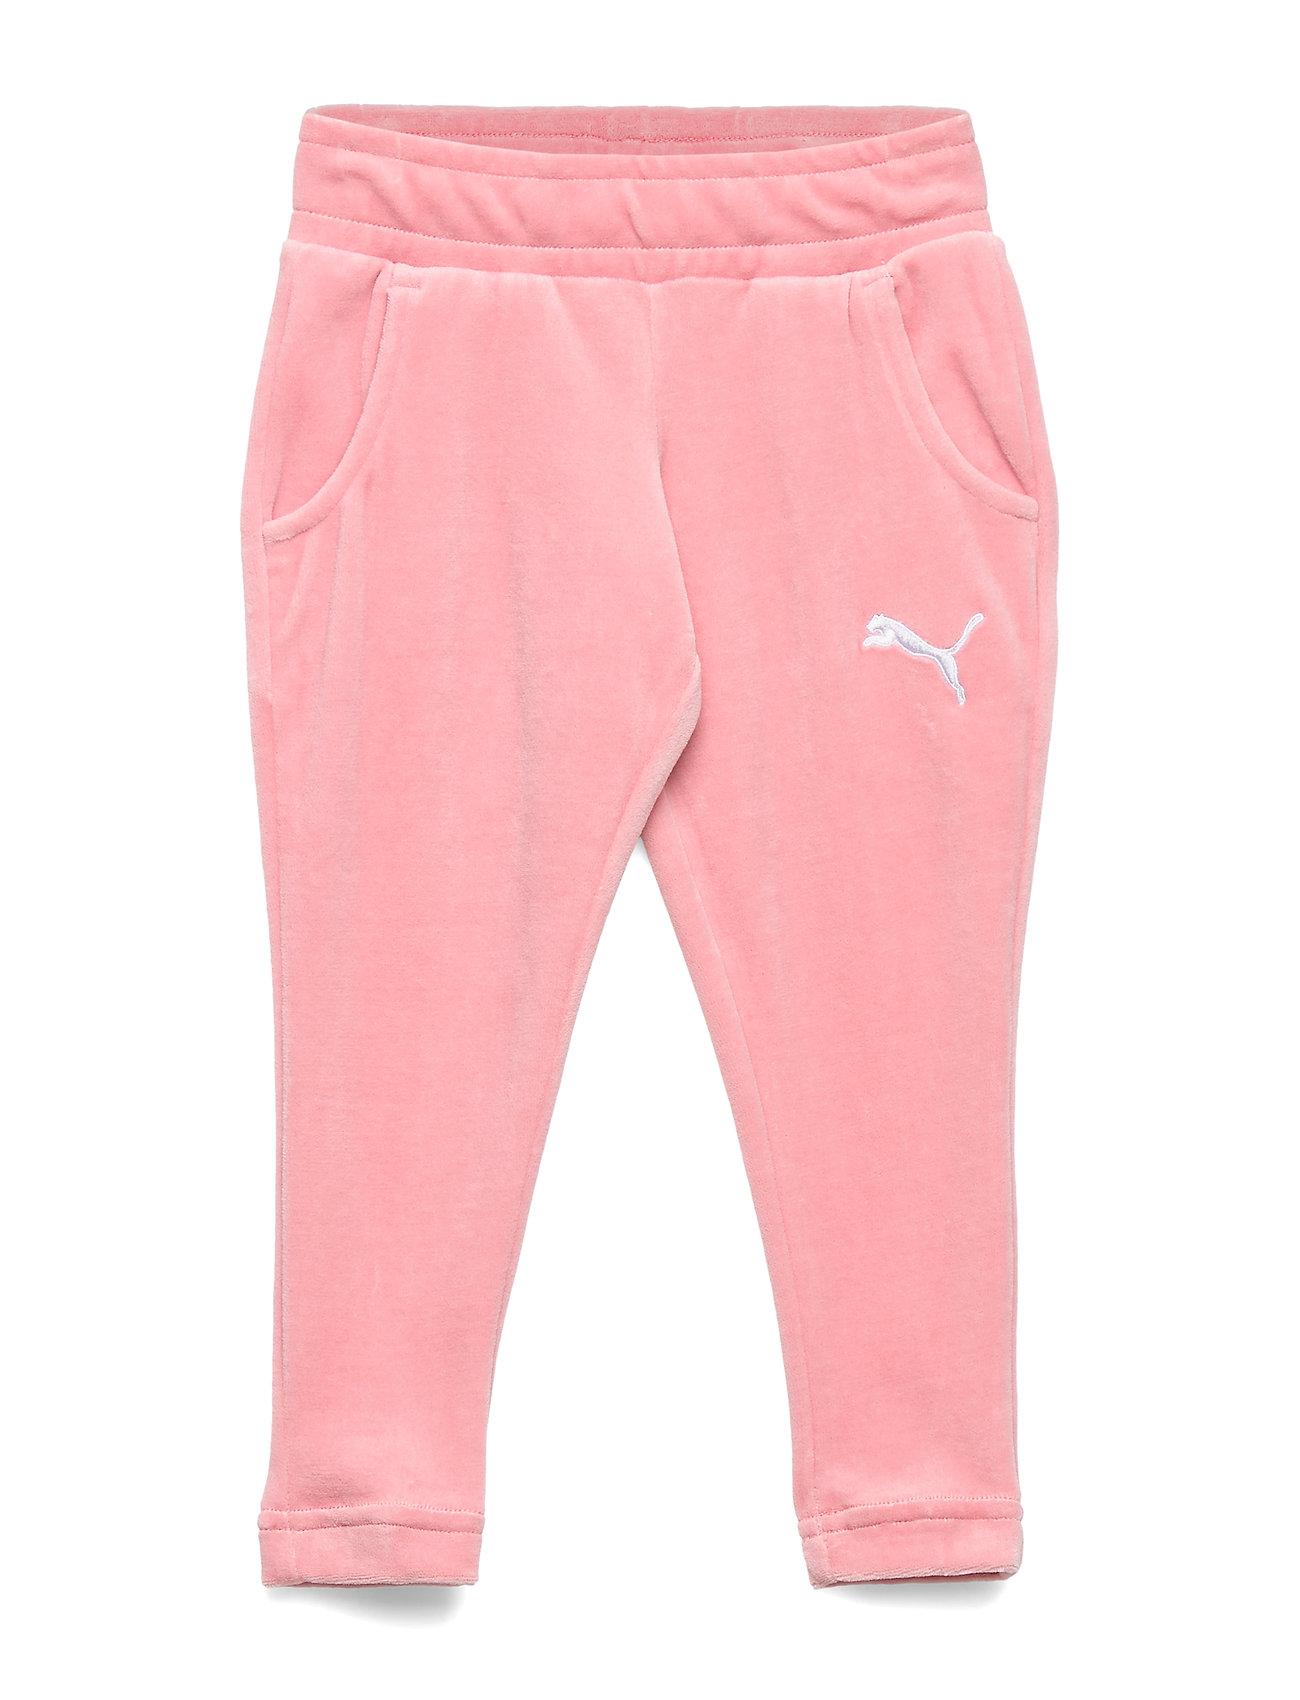 PUMA Alpha Velvet Pants G - BRIDAL ROSE